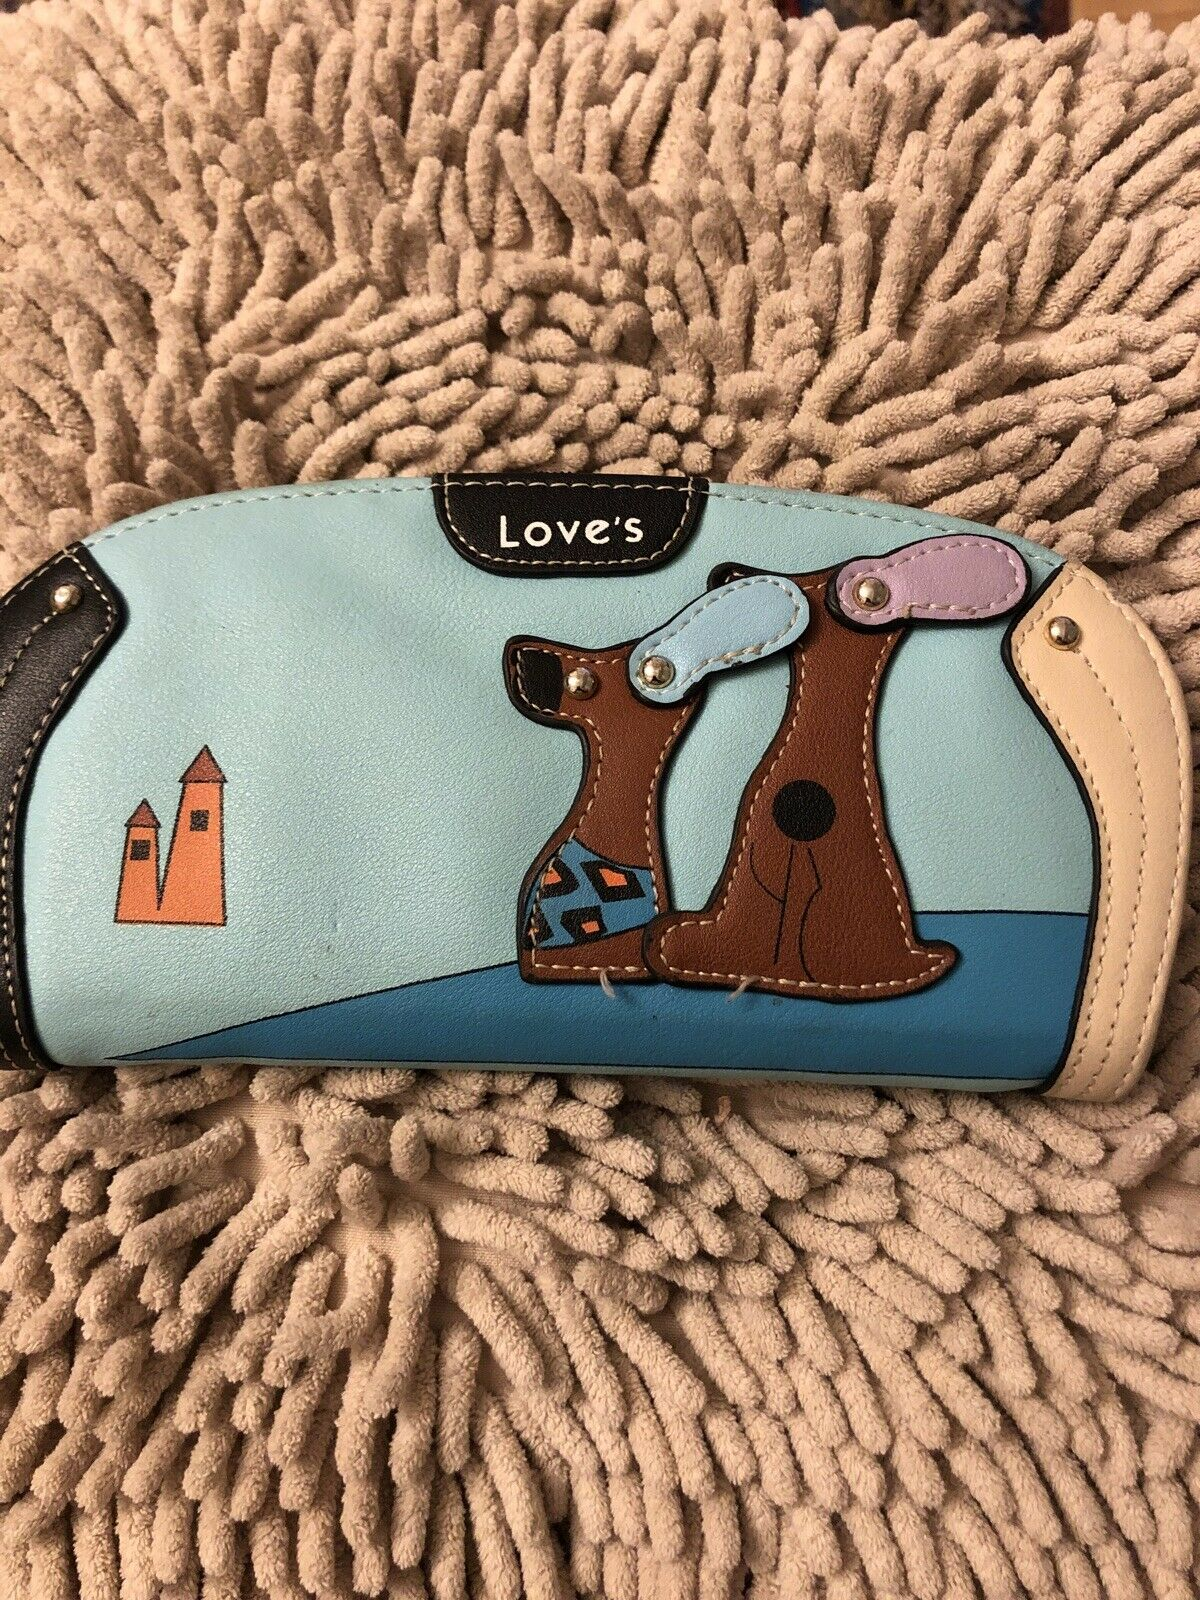 Love's Ladies Dog Design / Puppy themed Wallet / Purse Sausage Dog